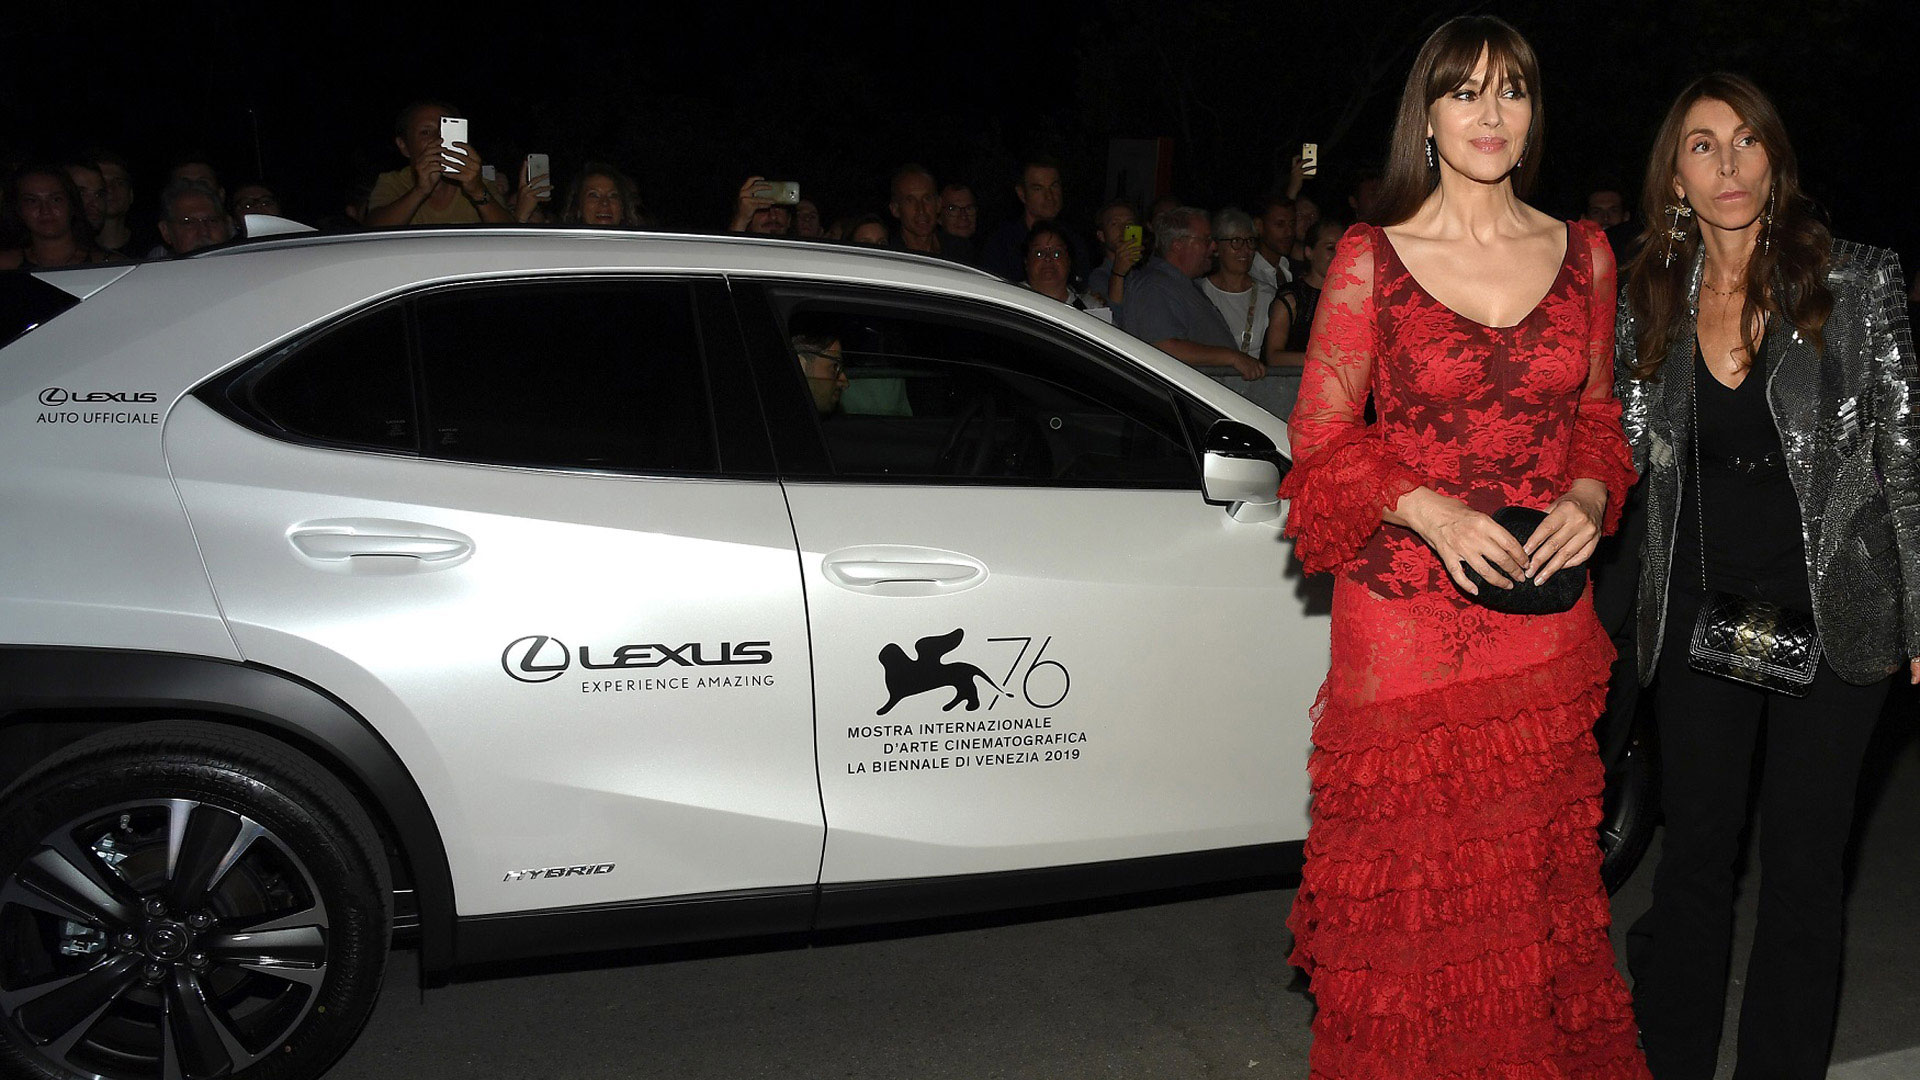 Lexus Venedik Film Festivali gallery04 v2